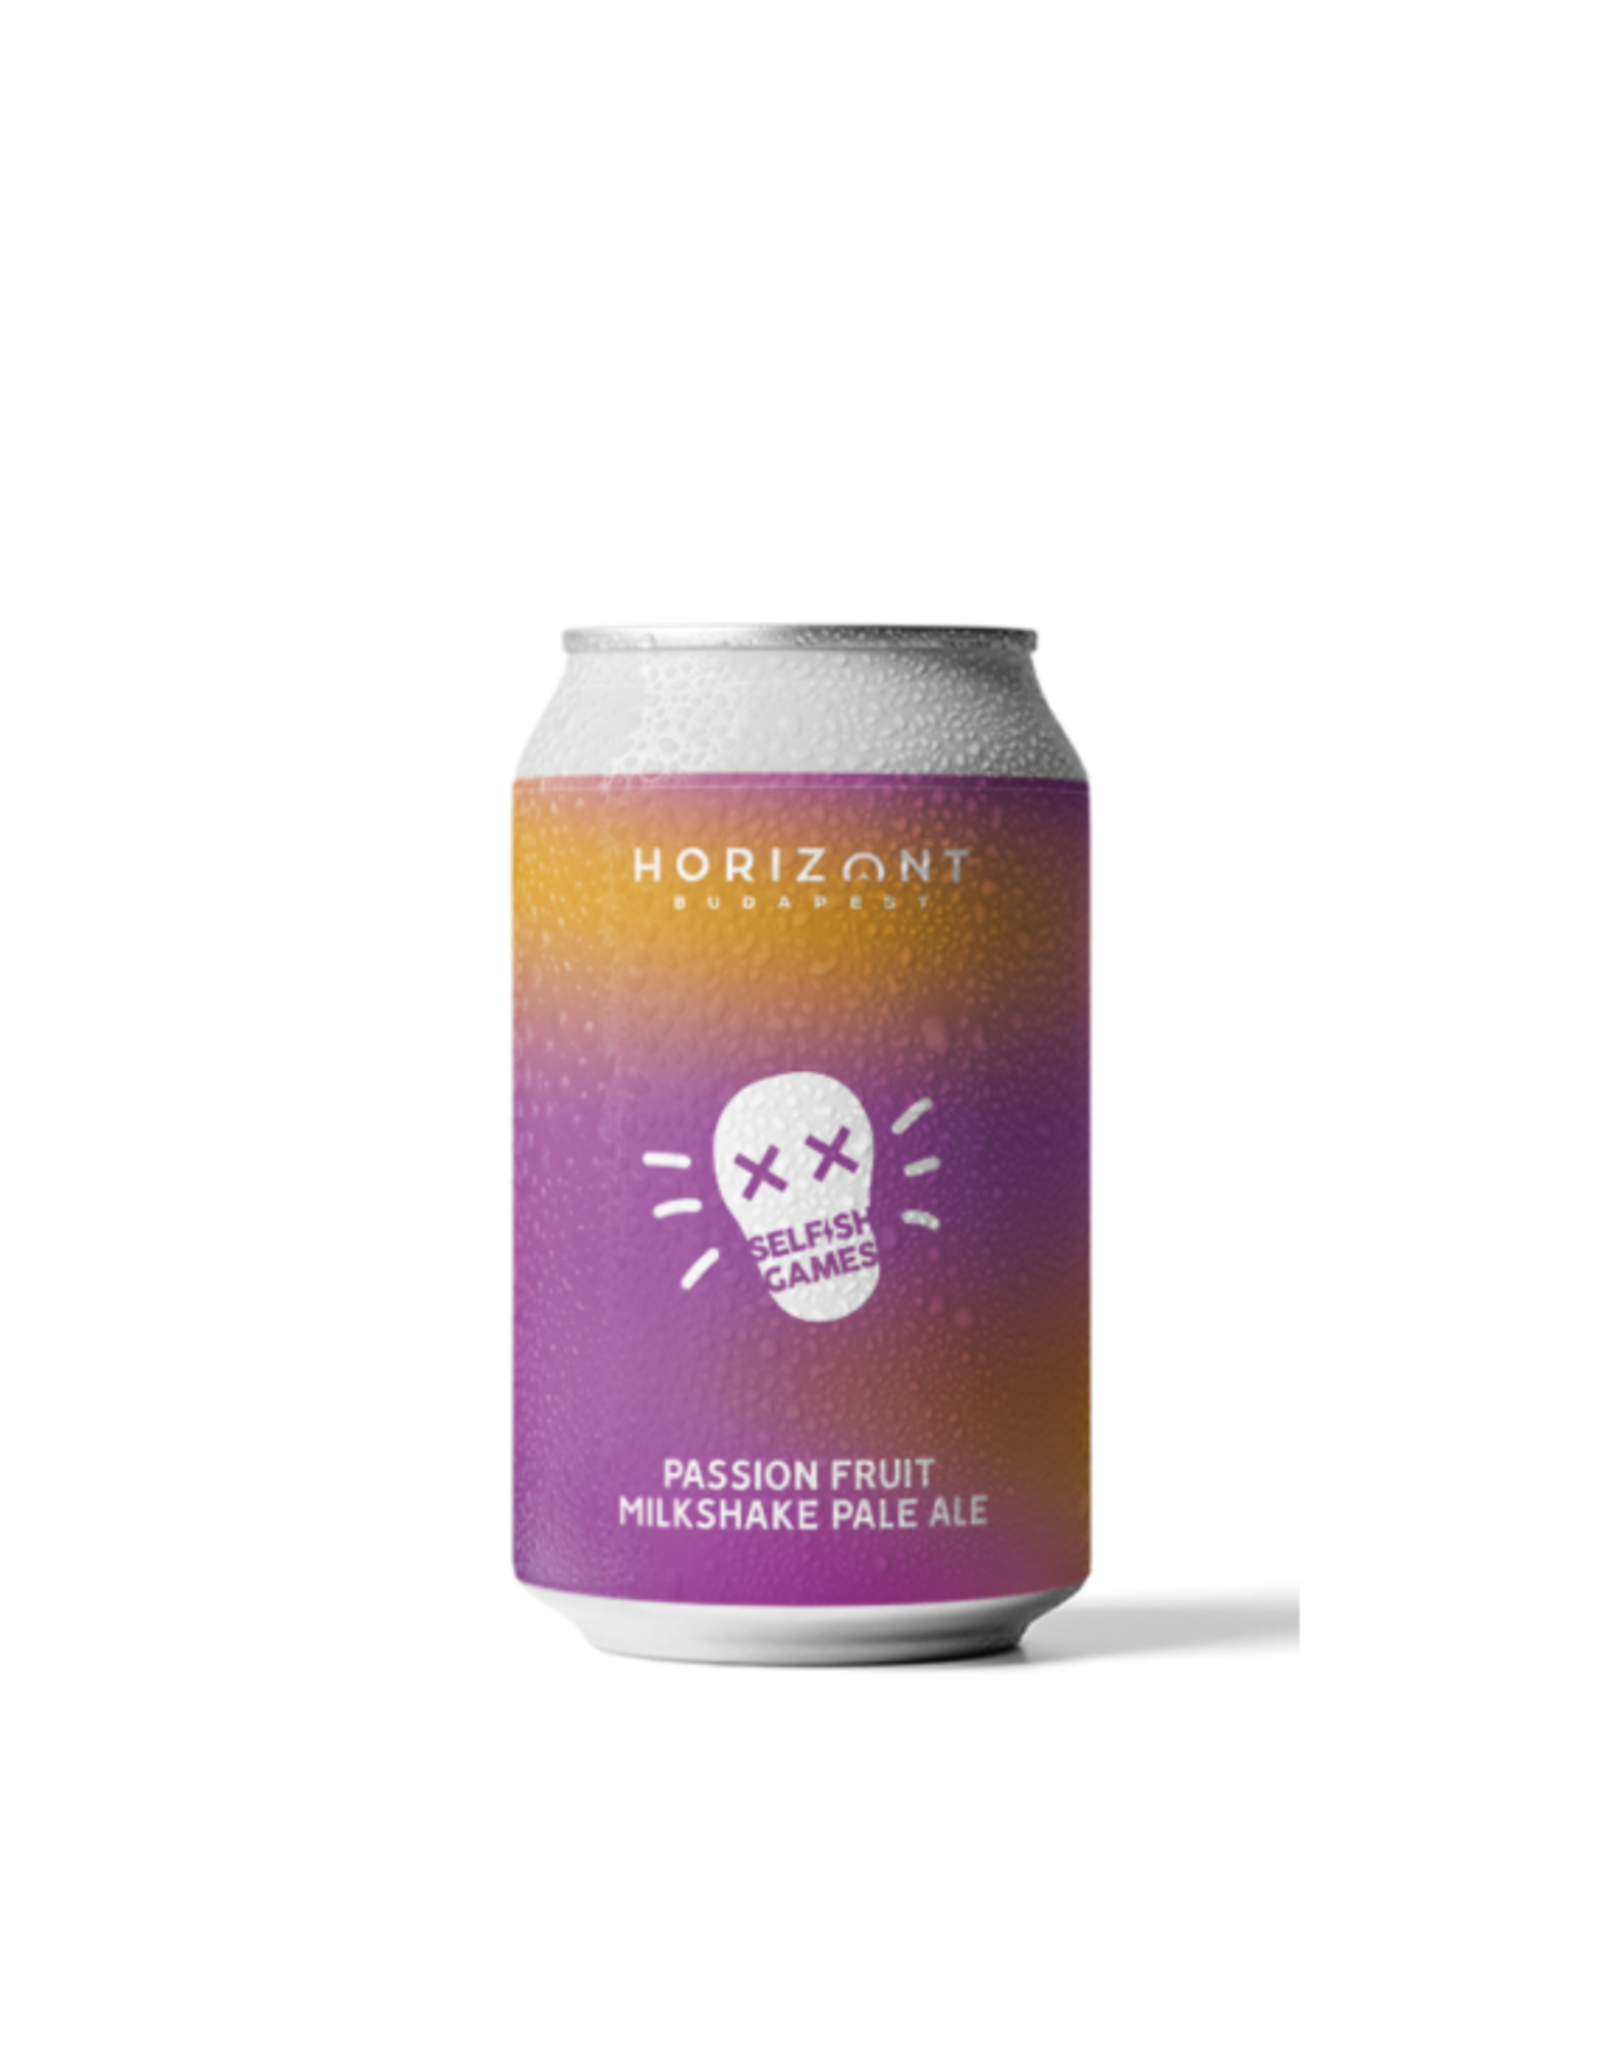 Horizont Horizont Passion Fruit Milkshake Pale Ale